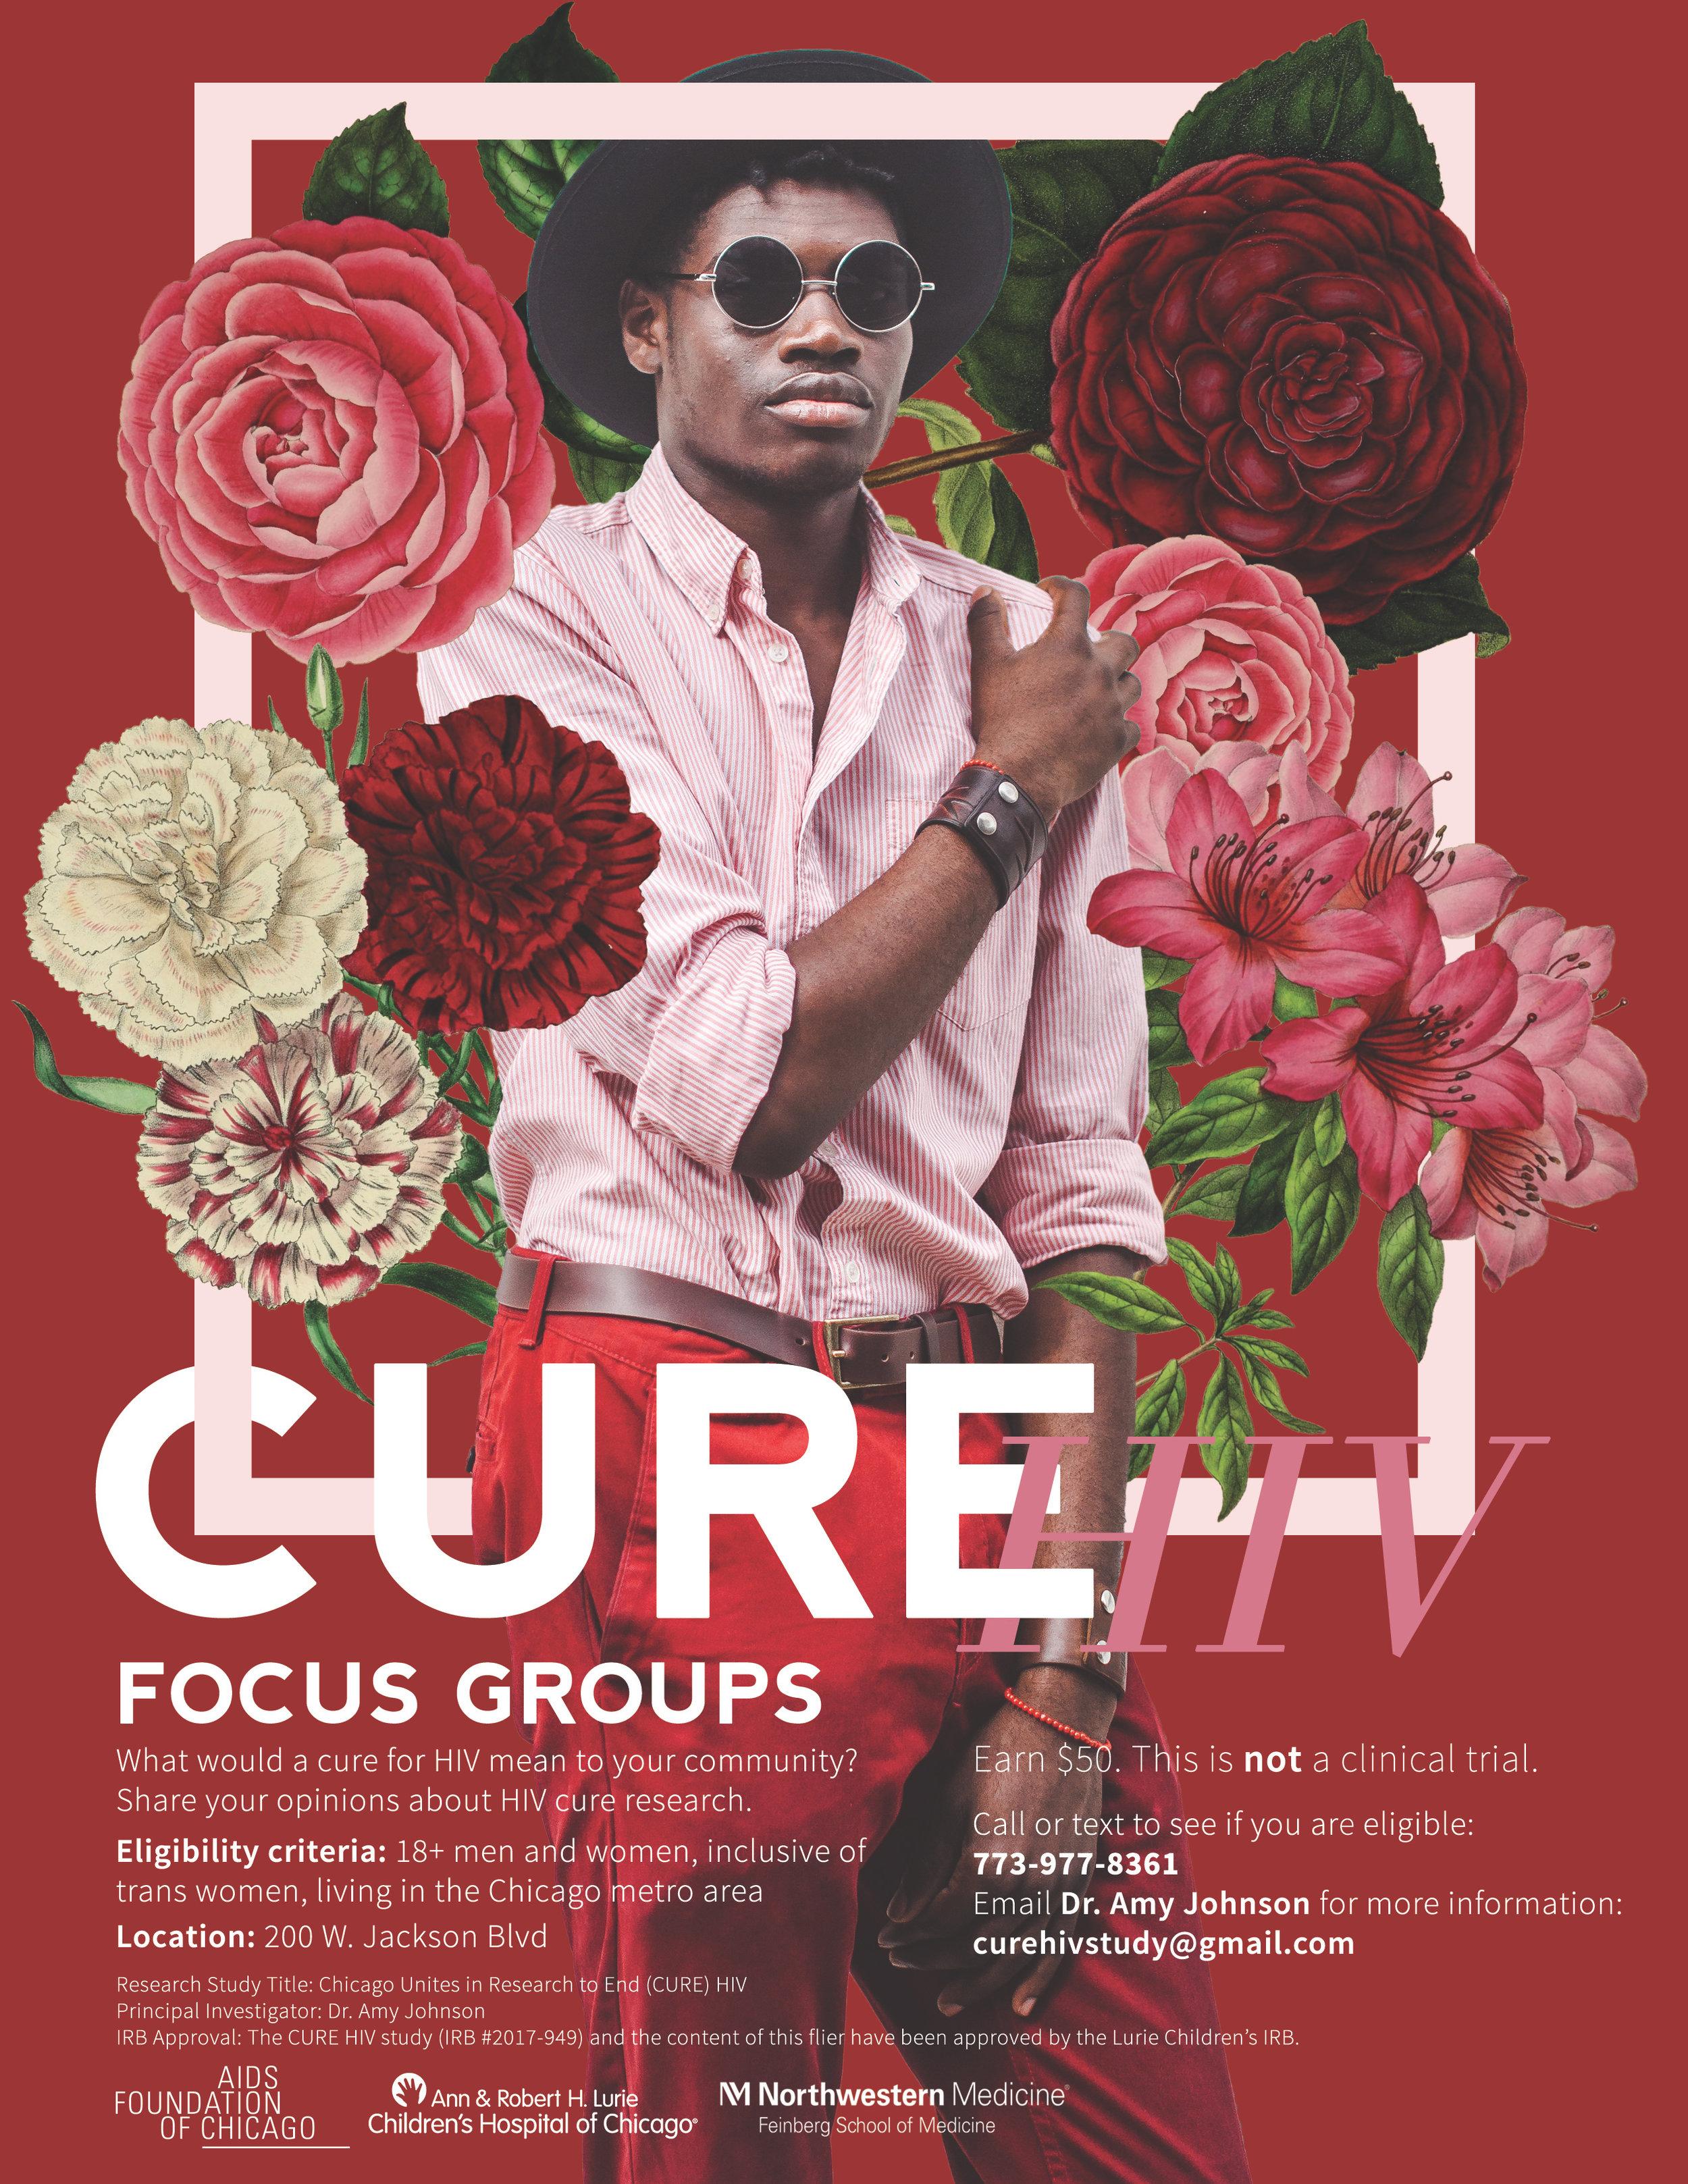 CURE HIV Black Man Ad.jpg